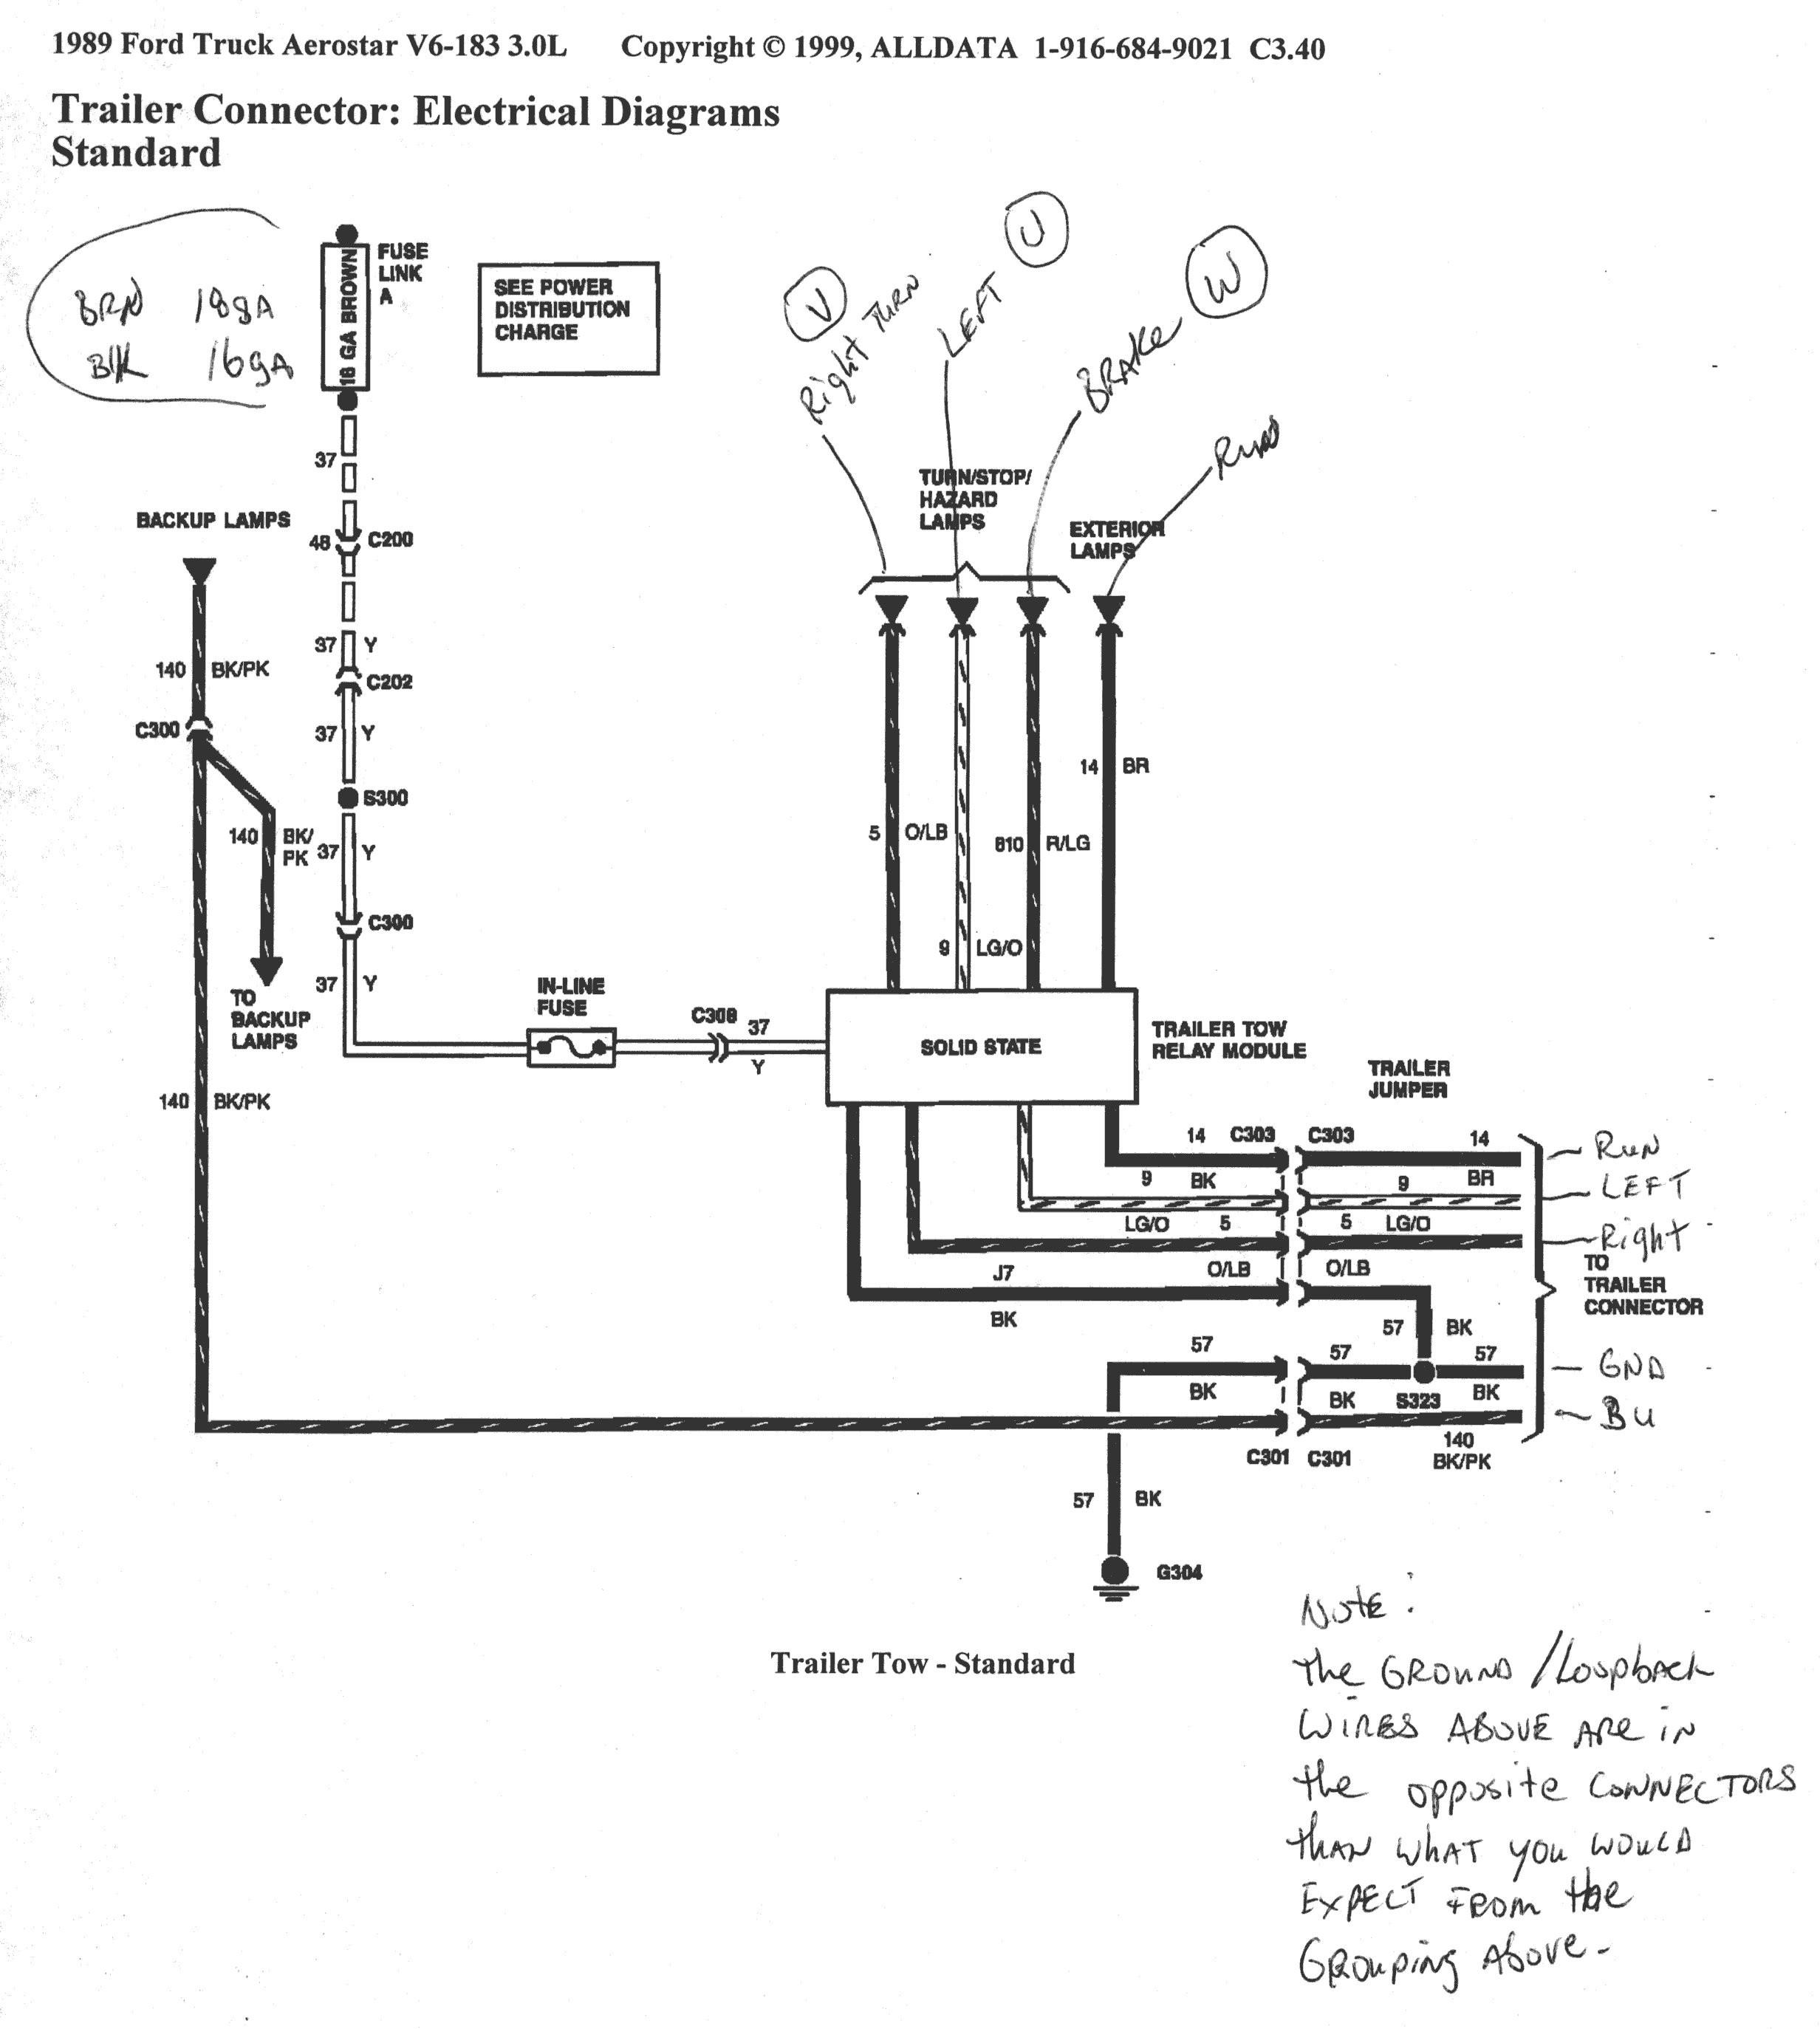 2000 ford F350 Tail Light Wiring Diagram Brake Light Diagram New 2000 ford F350 Tail Light Wiring Diagram Of 2000 ford F350 Tail Light Wiring Diagram